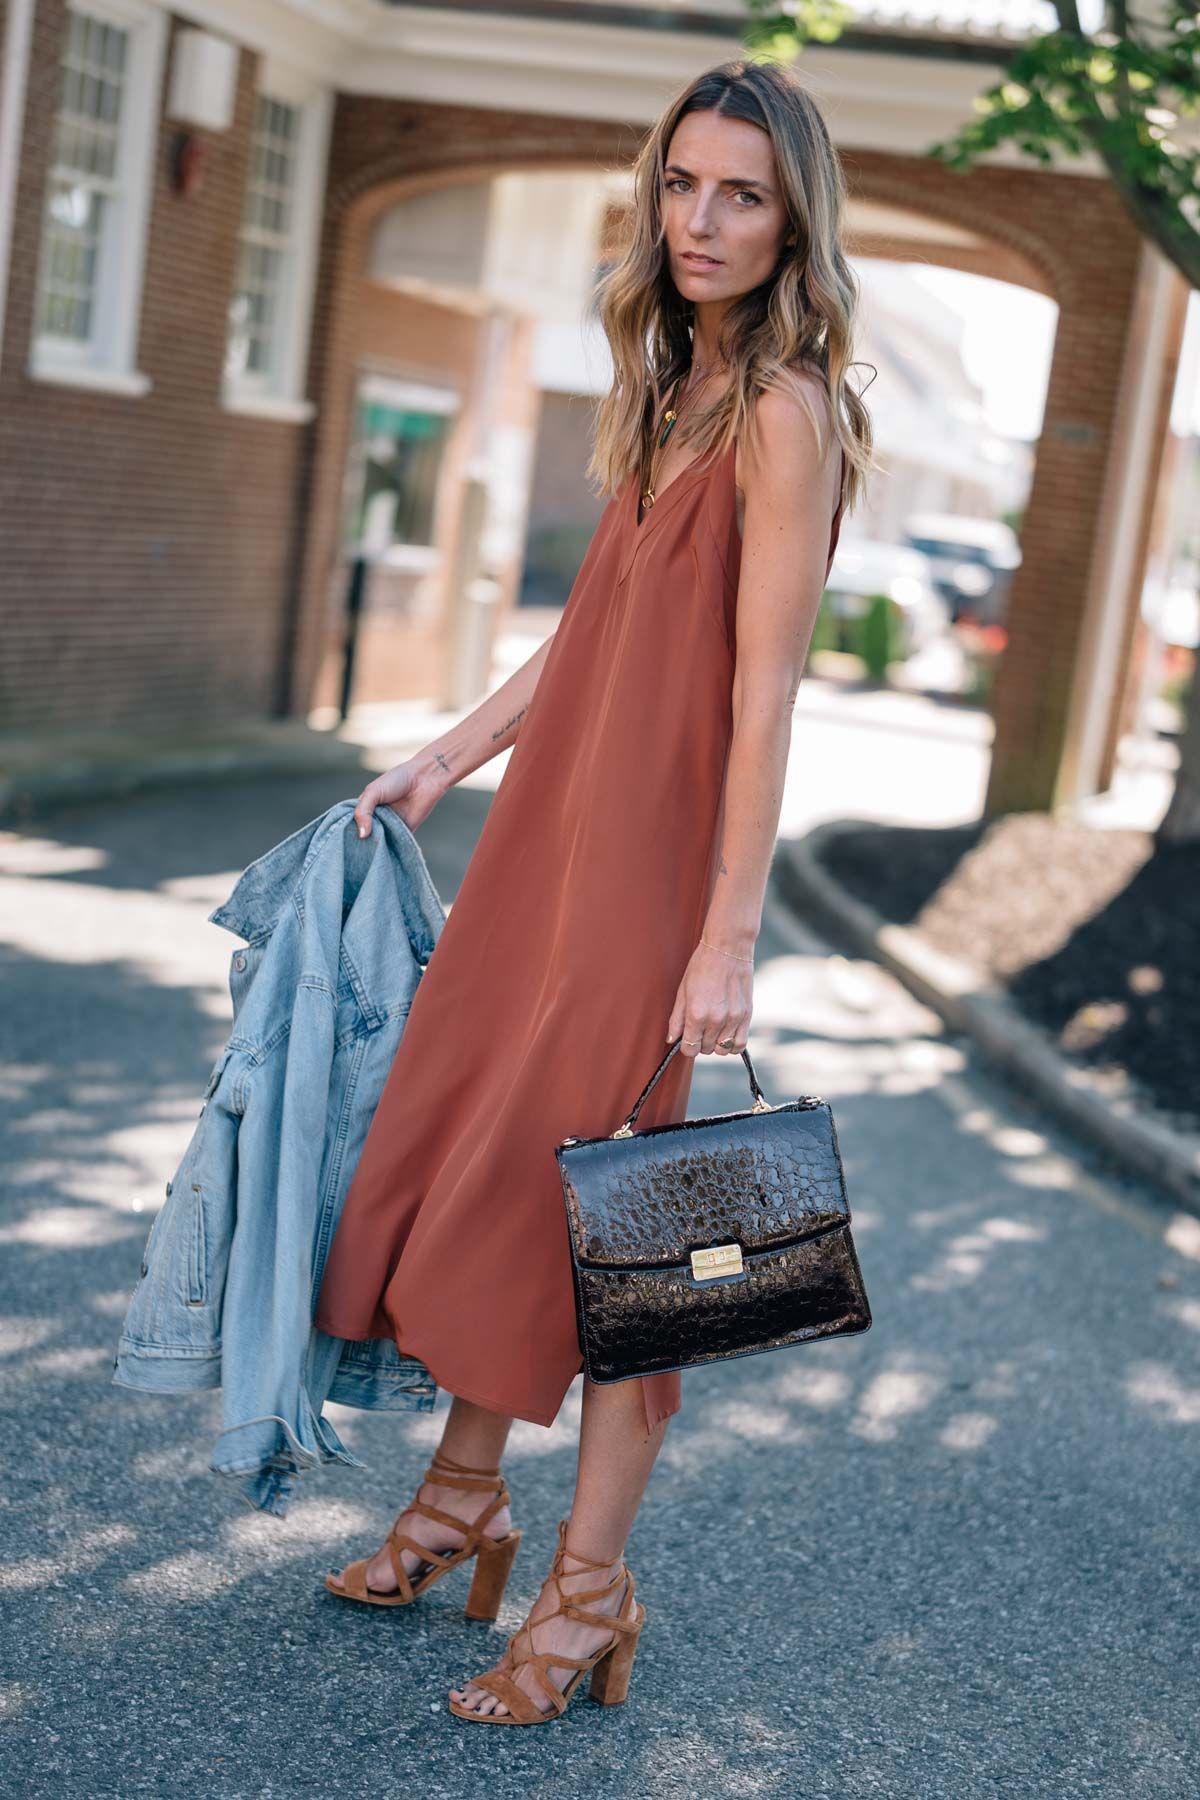 ad2cb1aa37 Cuyana silk slip dress  fall fashion to wear now